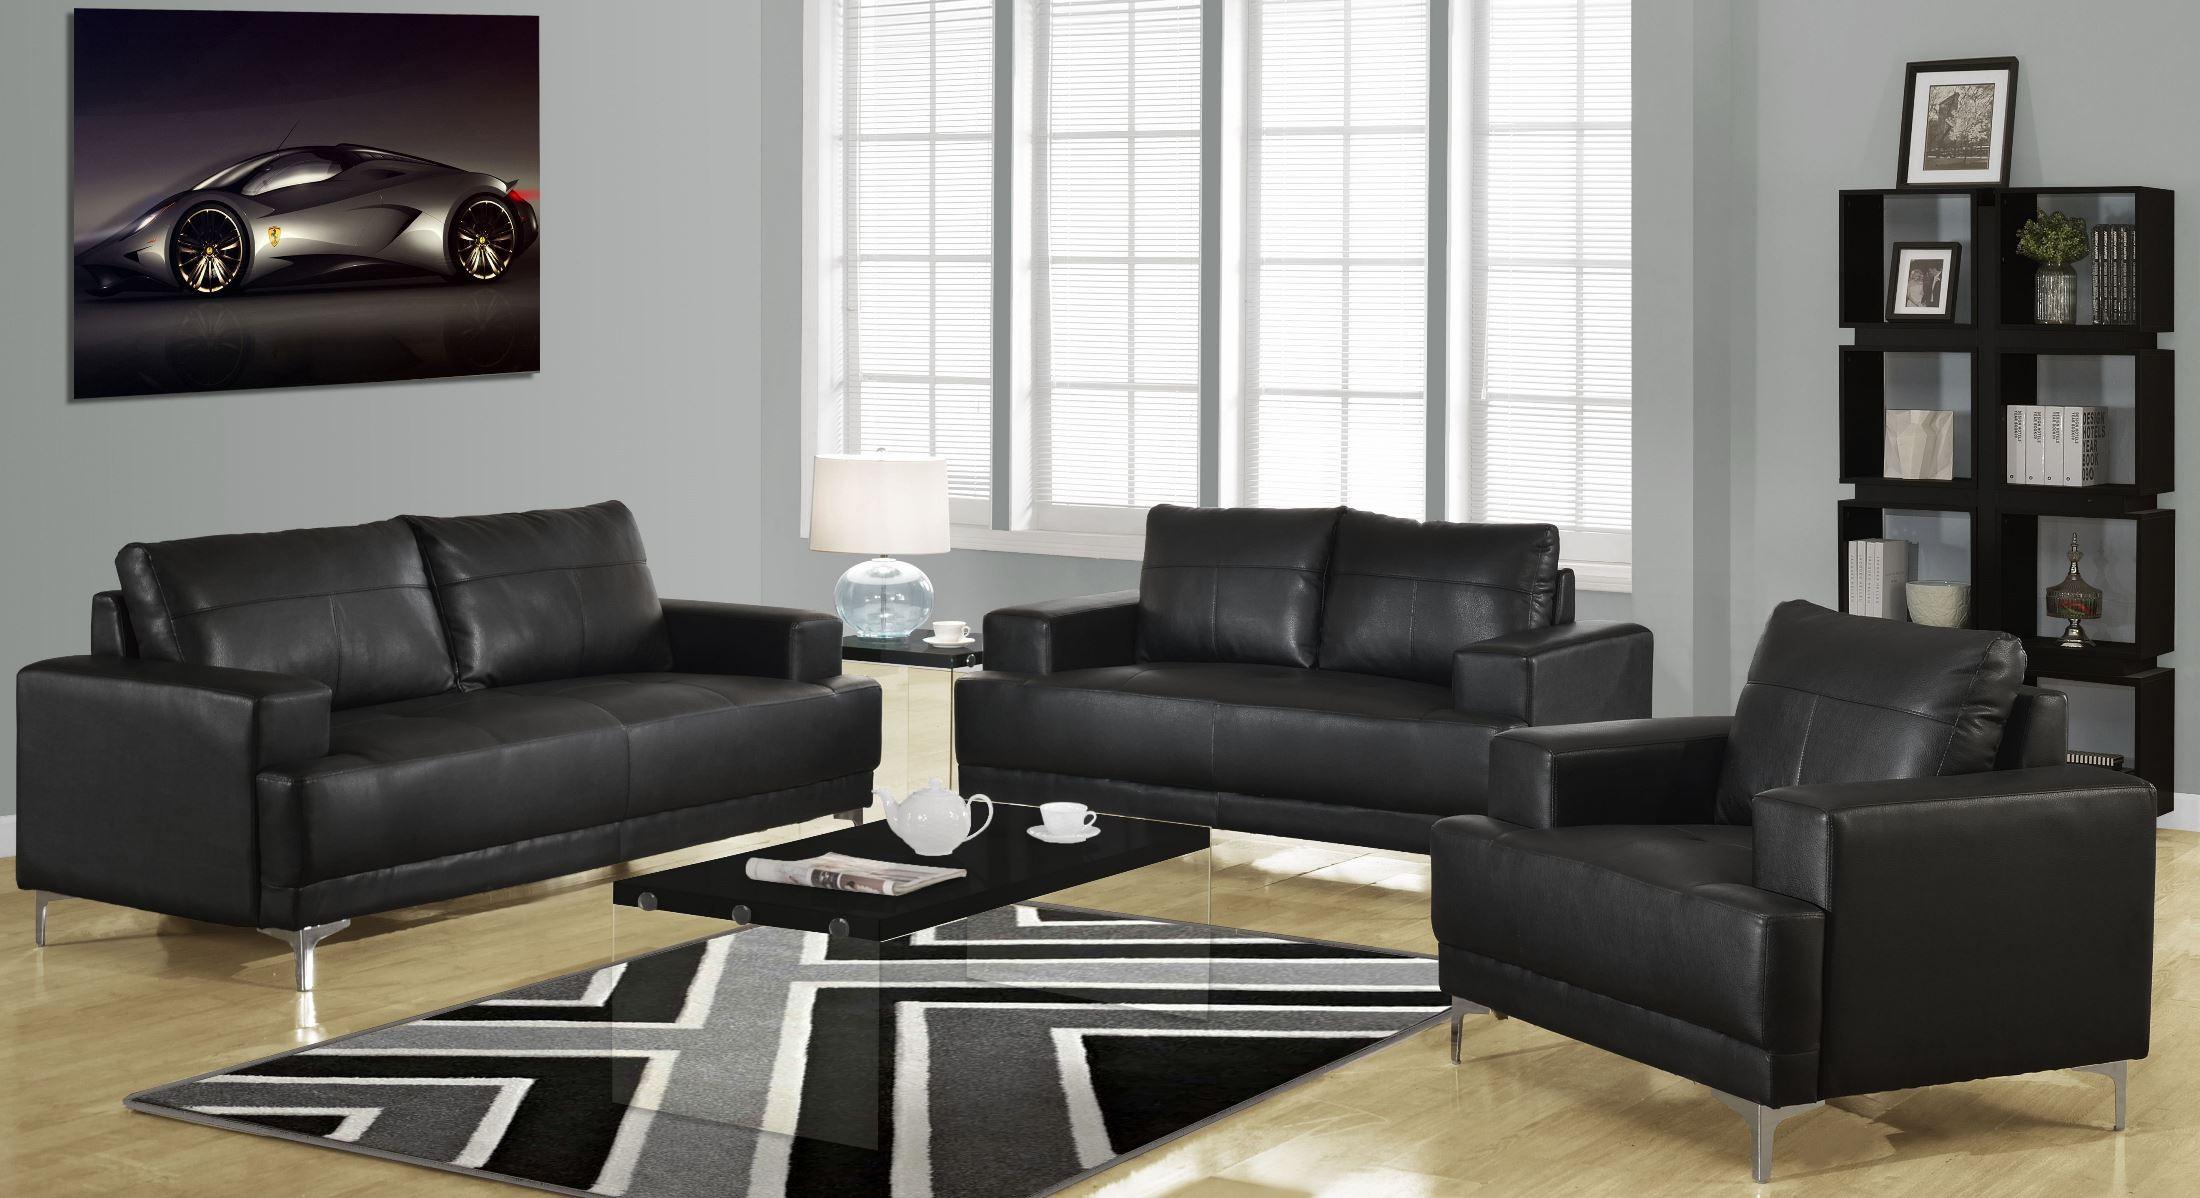 8603bk black bonded leather living room set from monarch for Black leather living room furniture sets